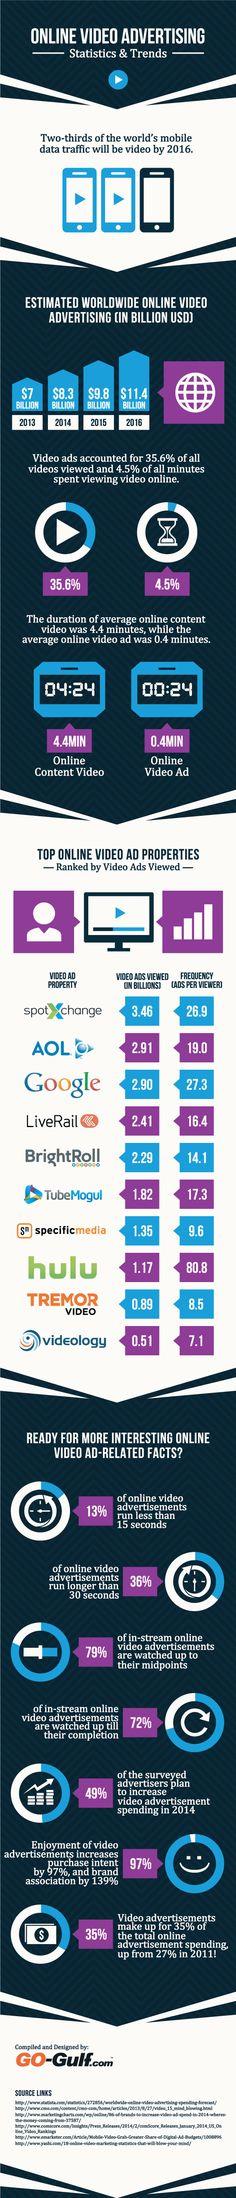 Online Video Advertising – Statistics & Trends